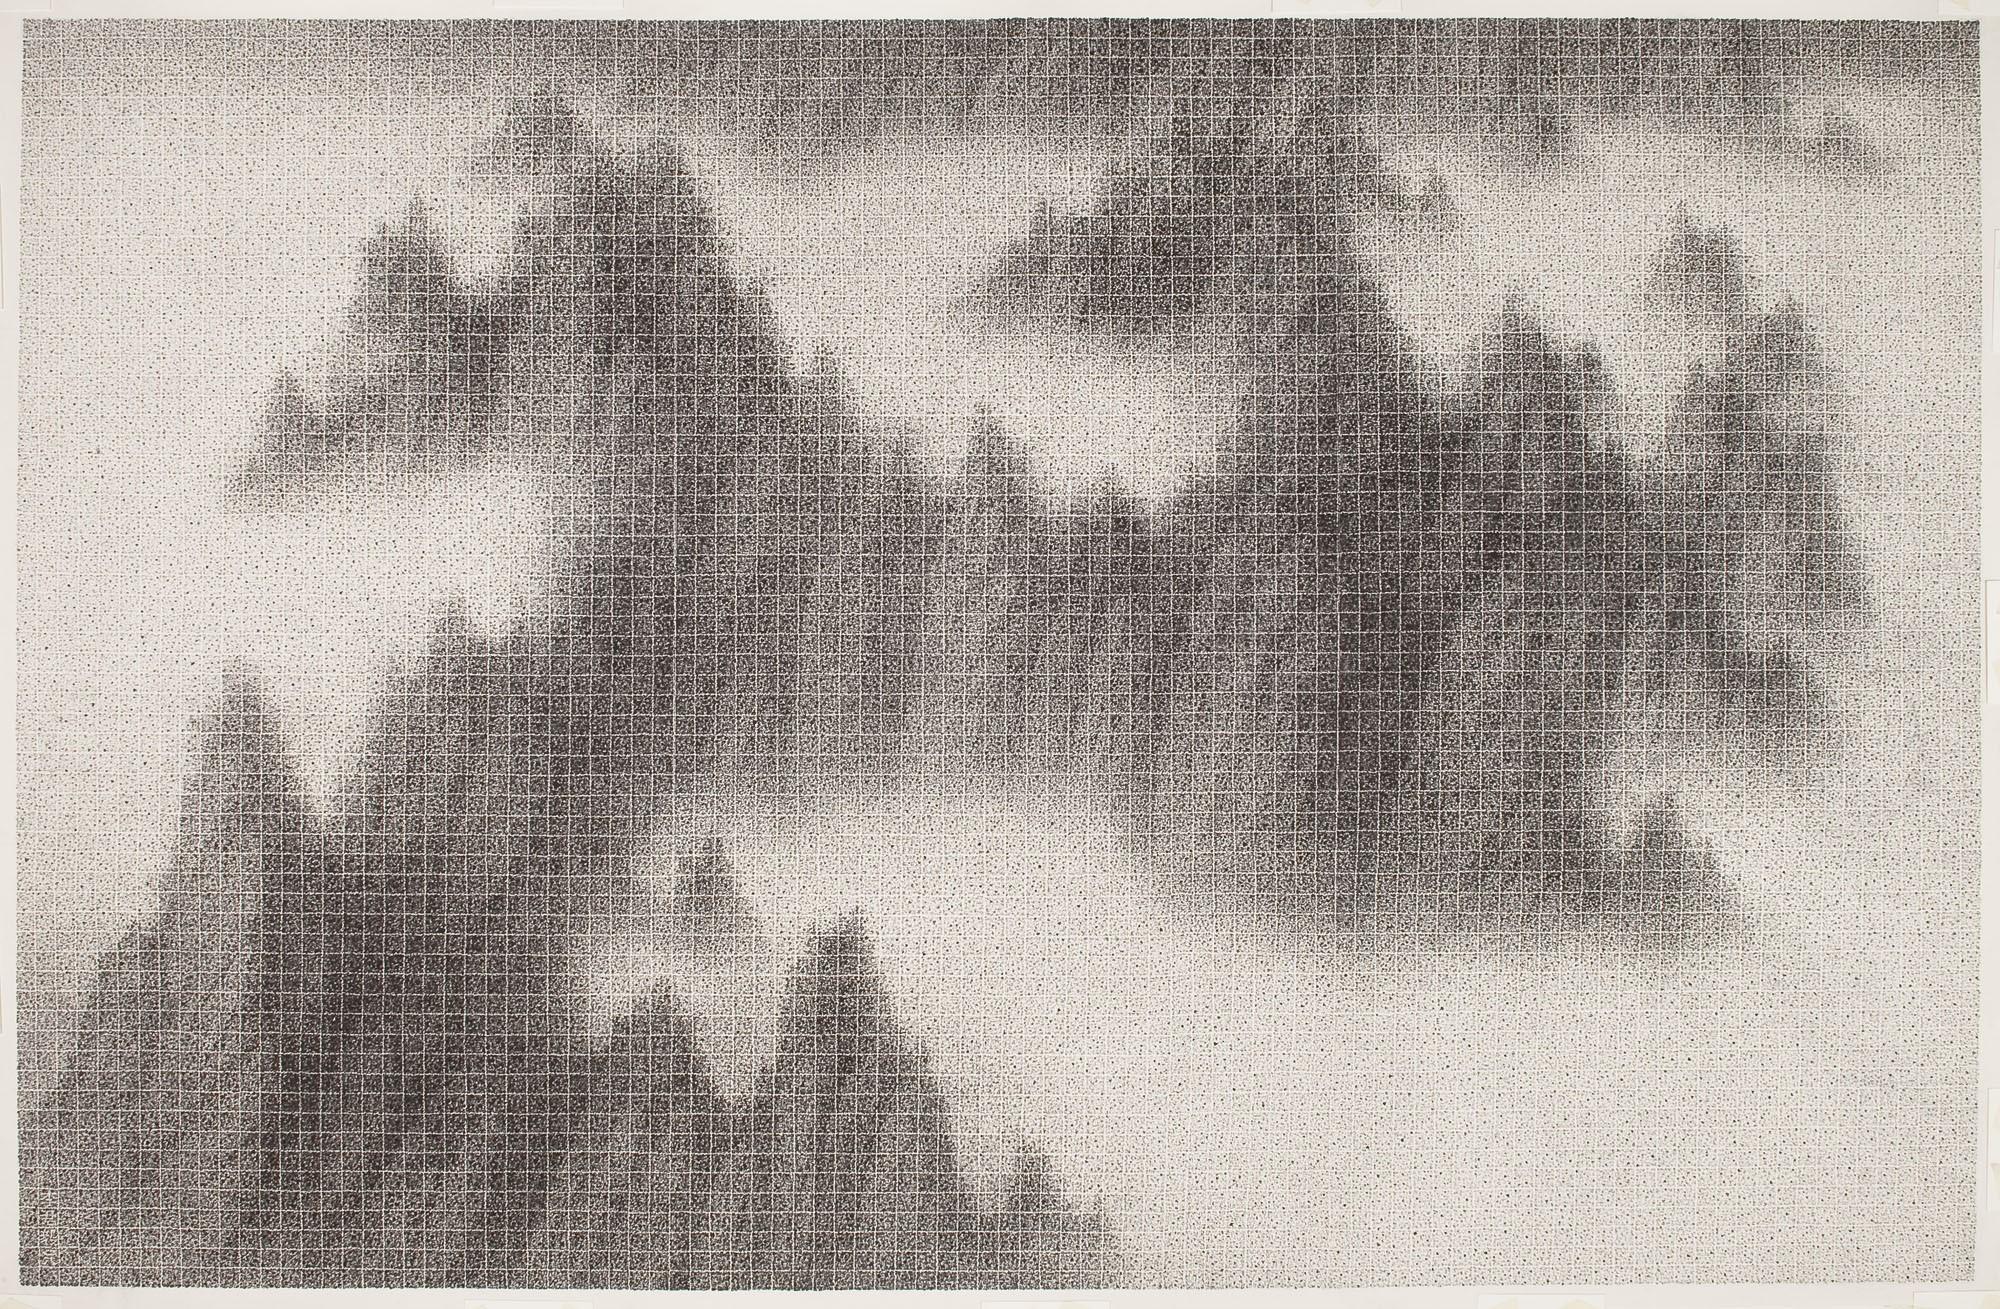 Heart Landscape by Chun-yi Lee